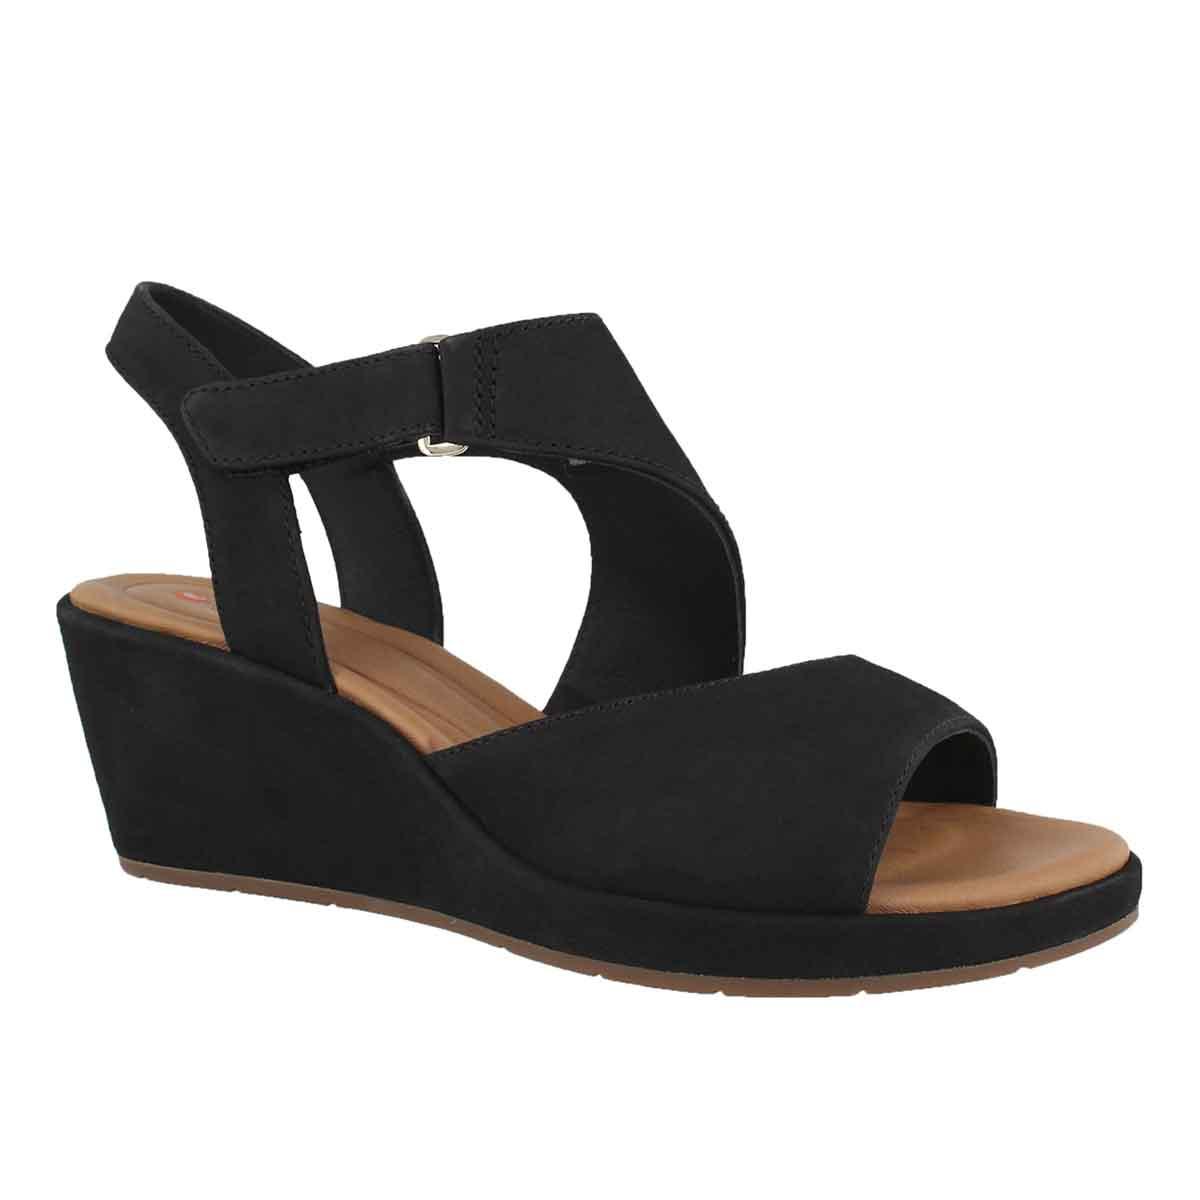 Women's UN PLAZA SLING black wedge sandal